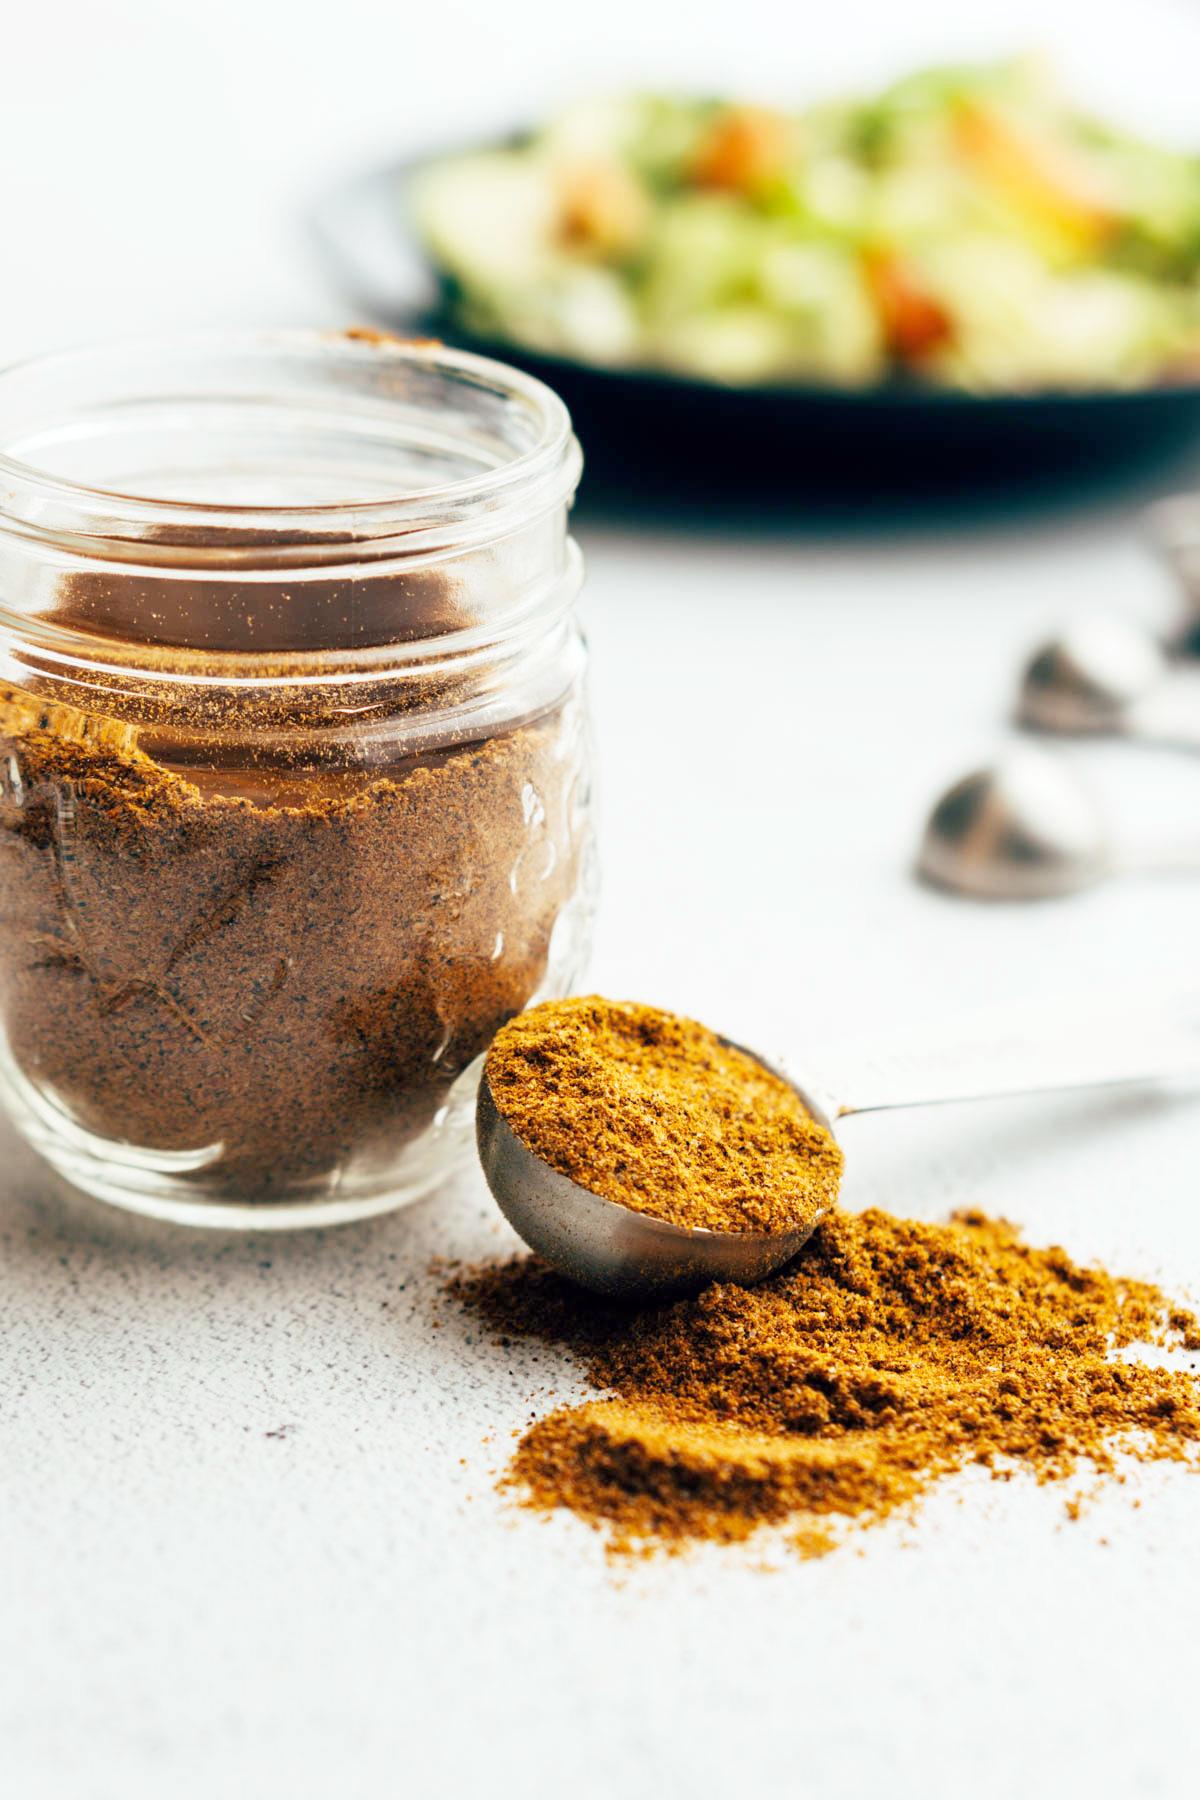 Spilled seasoning near mason jar and salad.